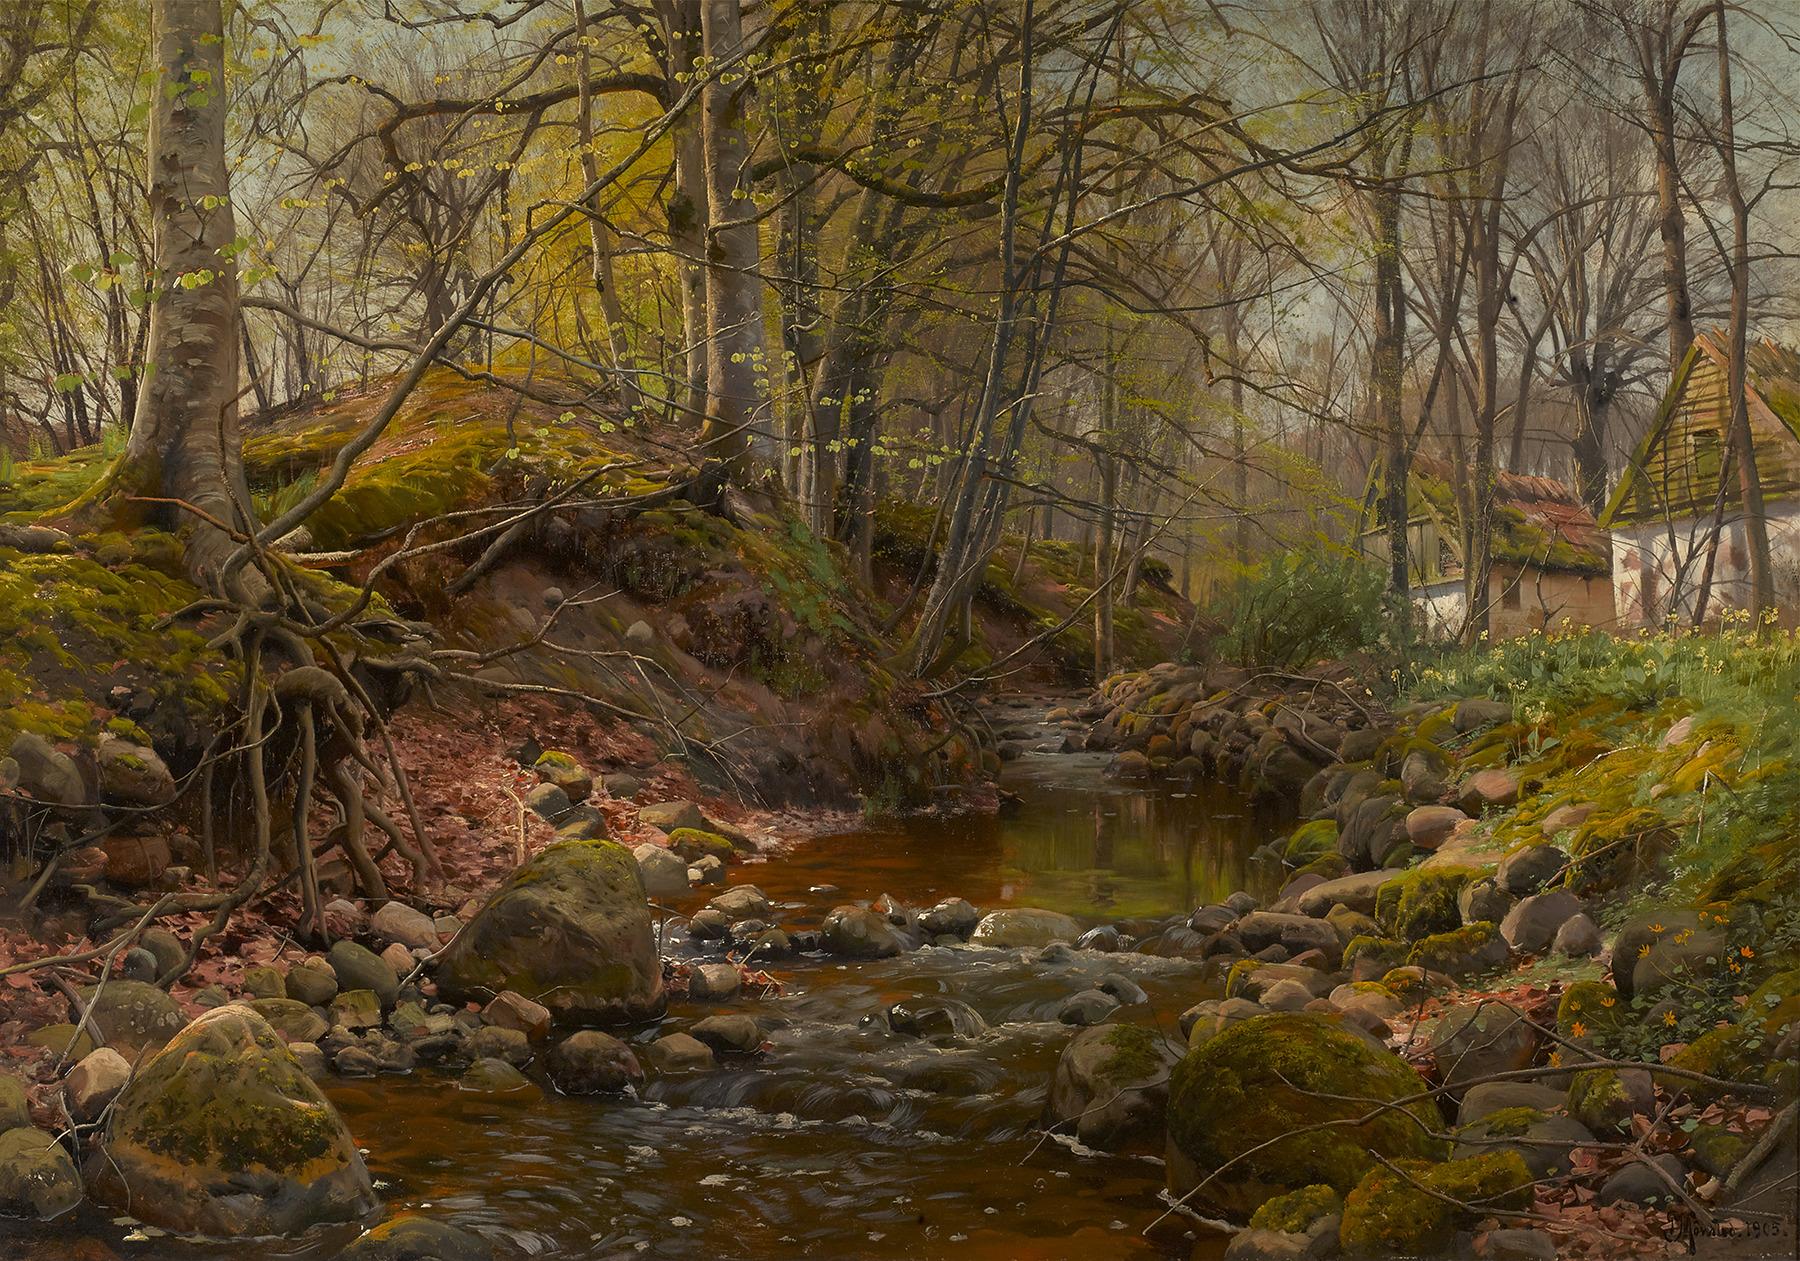 Peder Mork Monsted, A Forest Stream